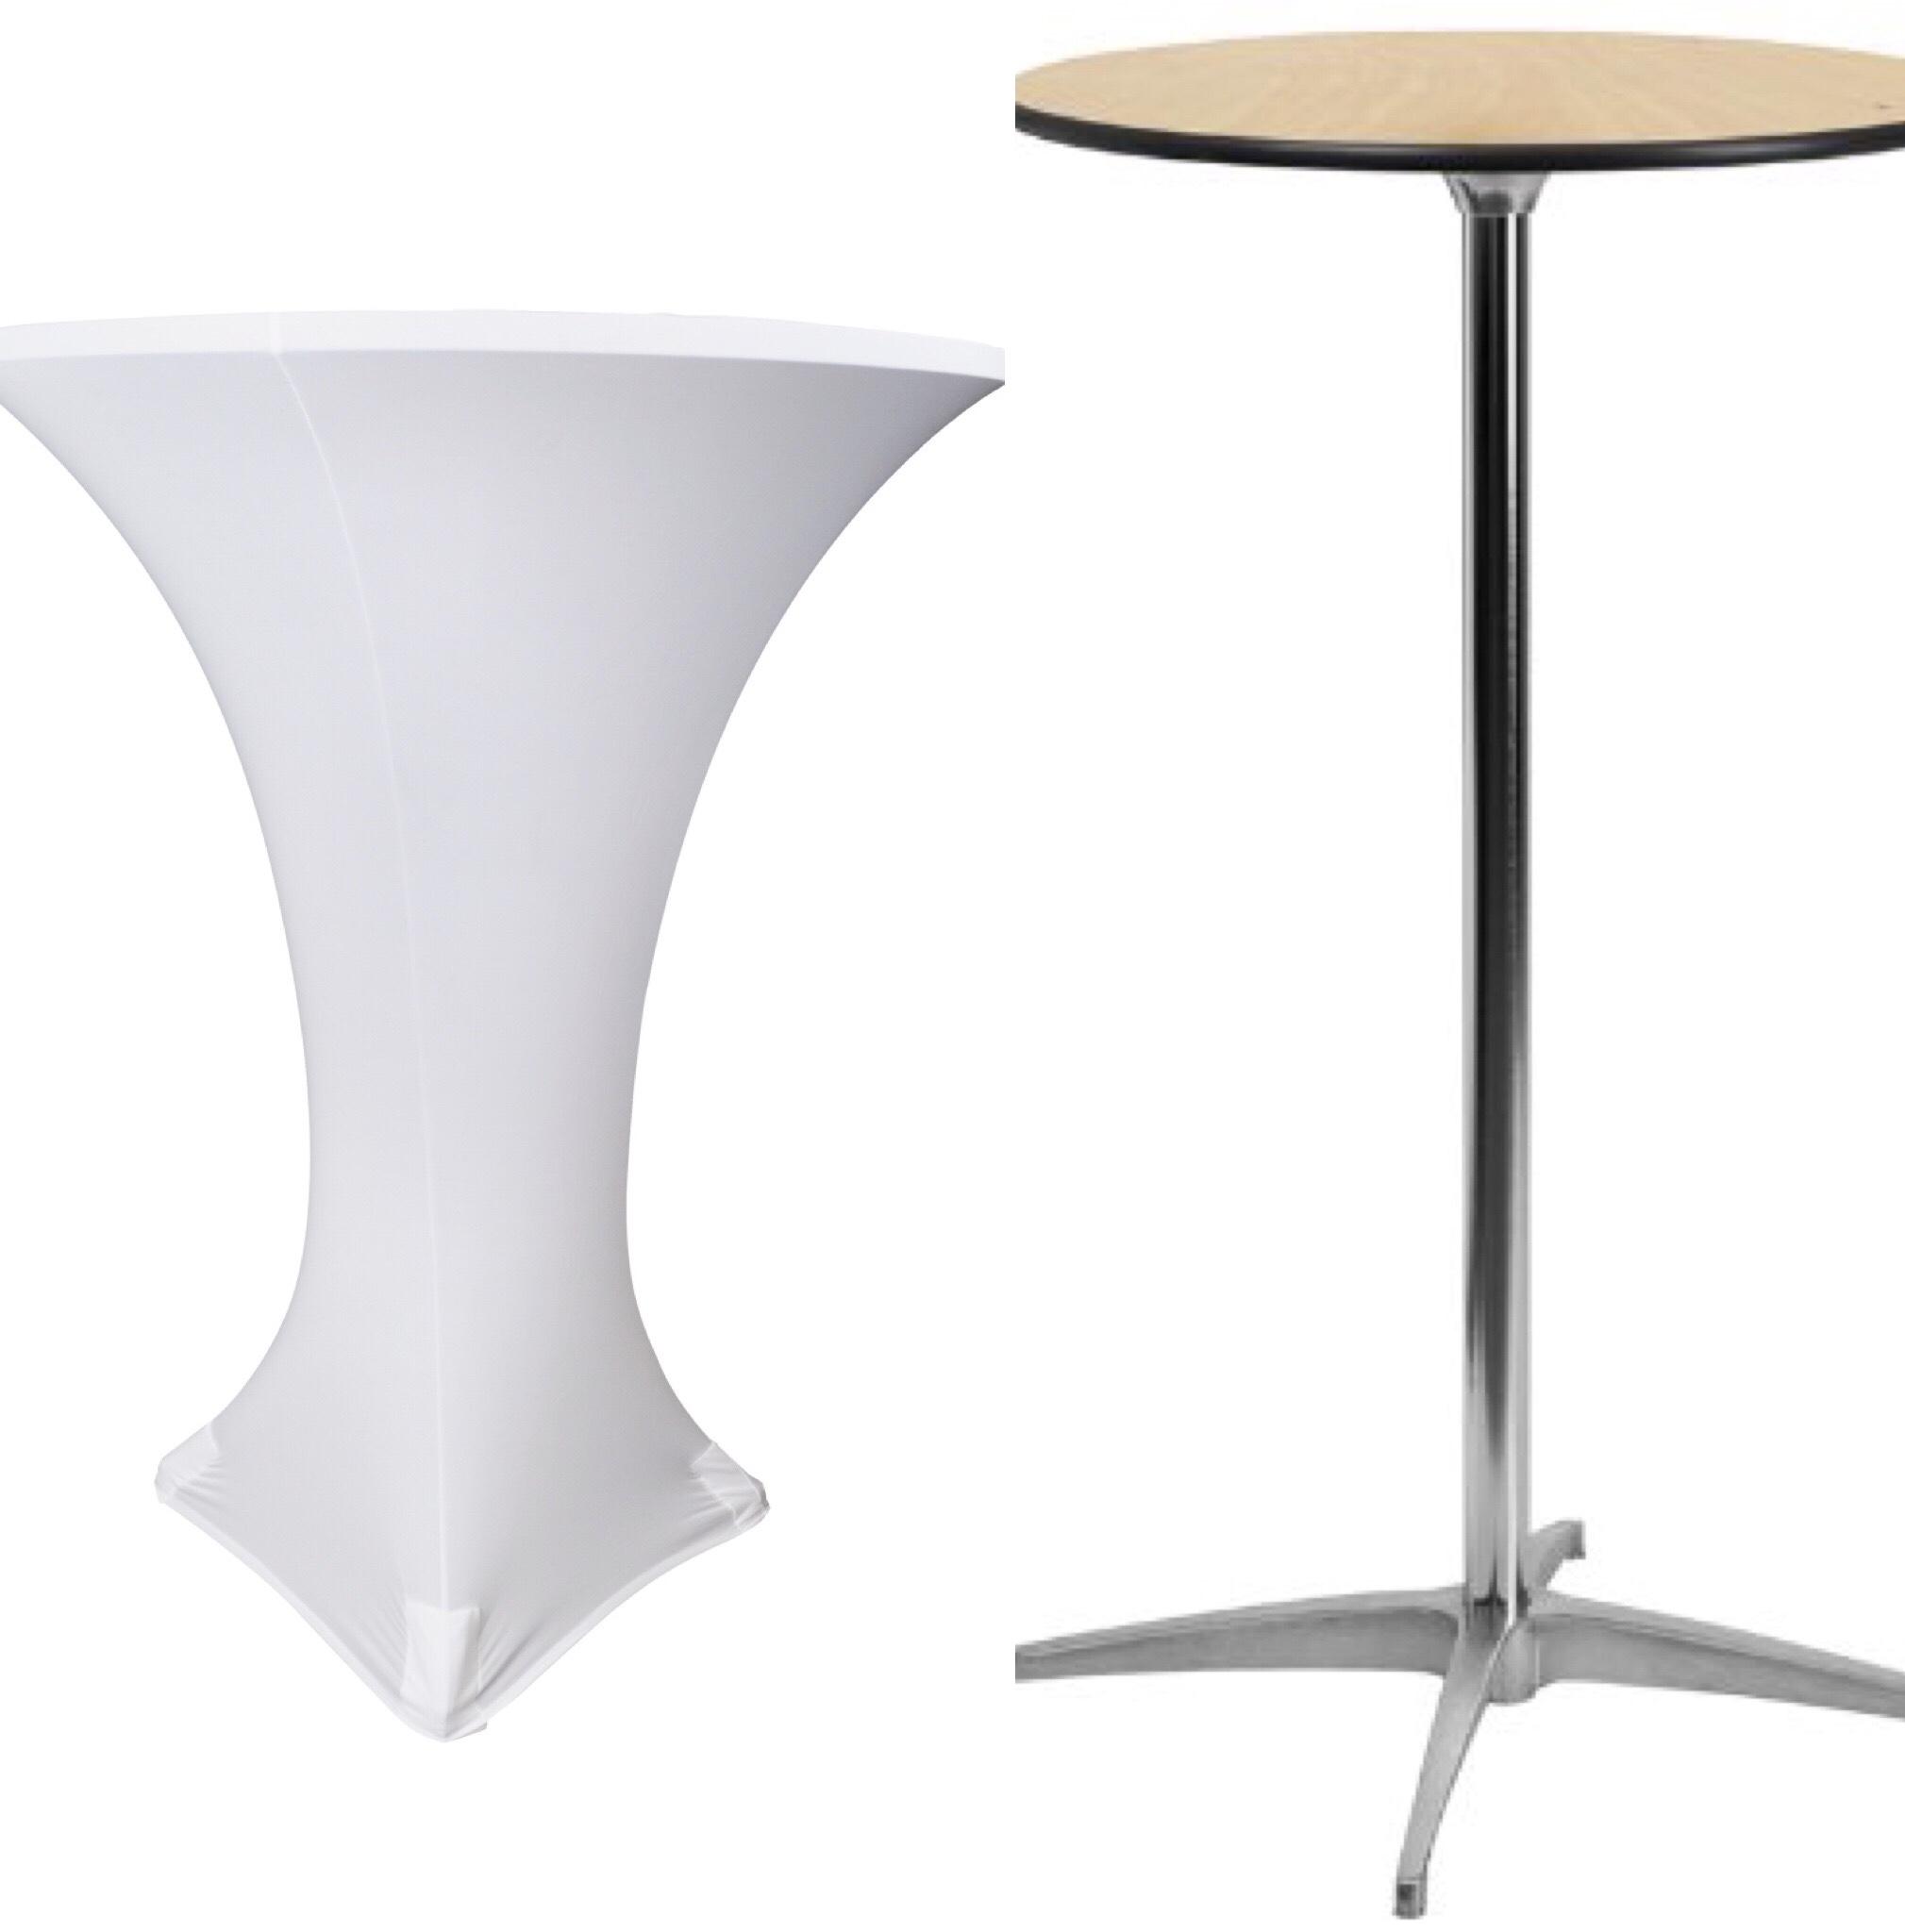 round highboy table $15 - Adjustable Height